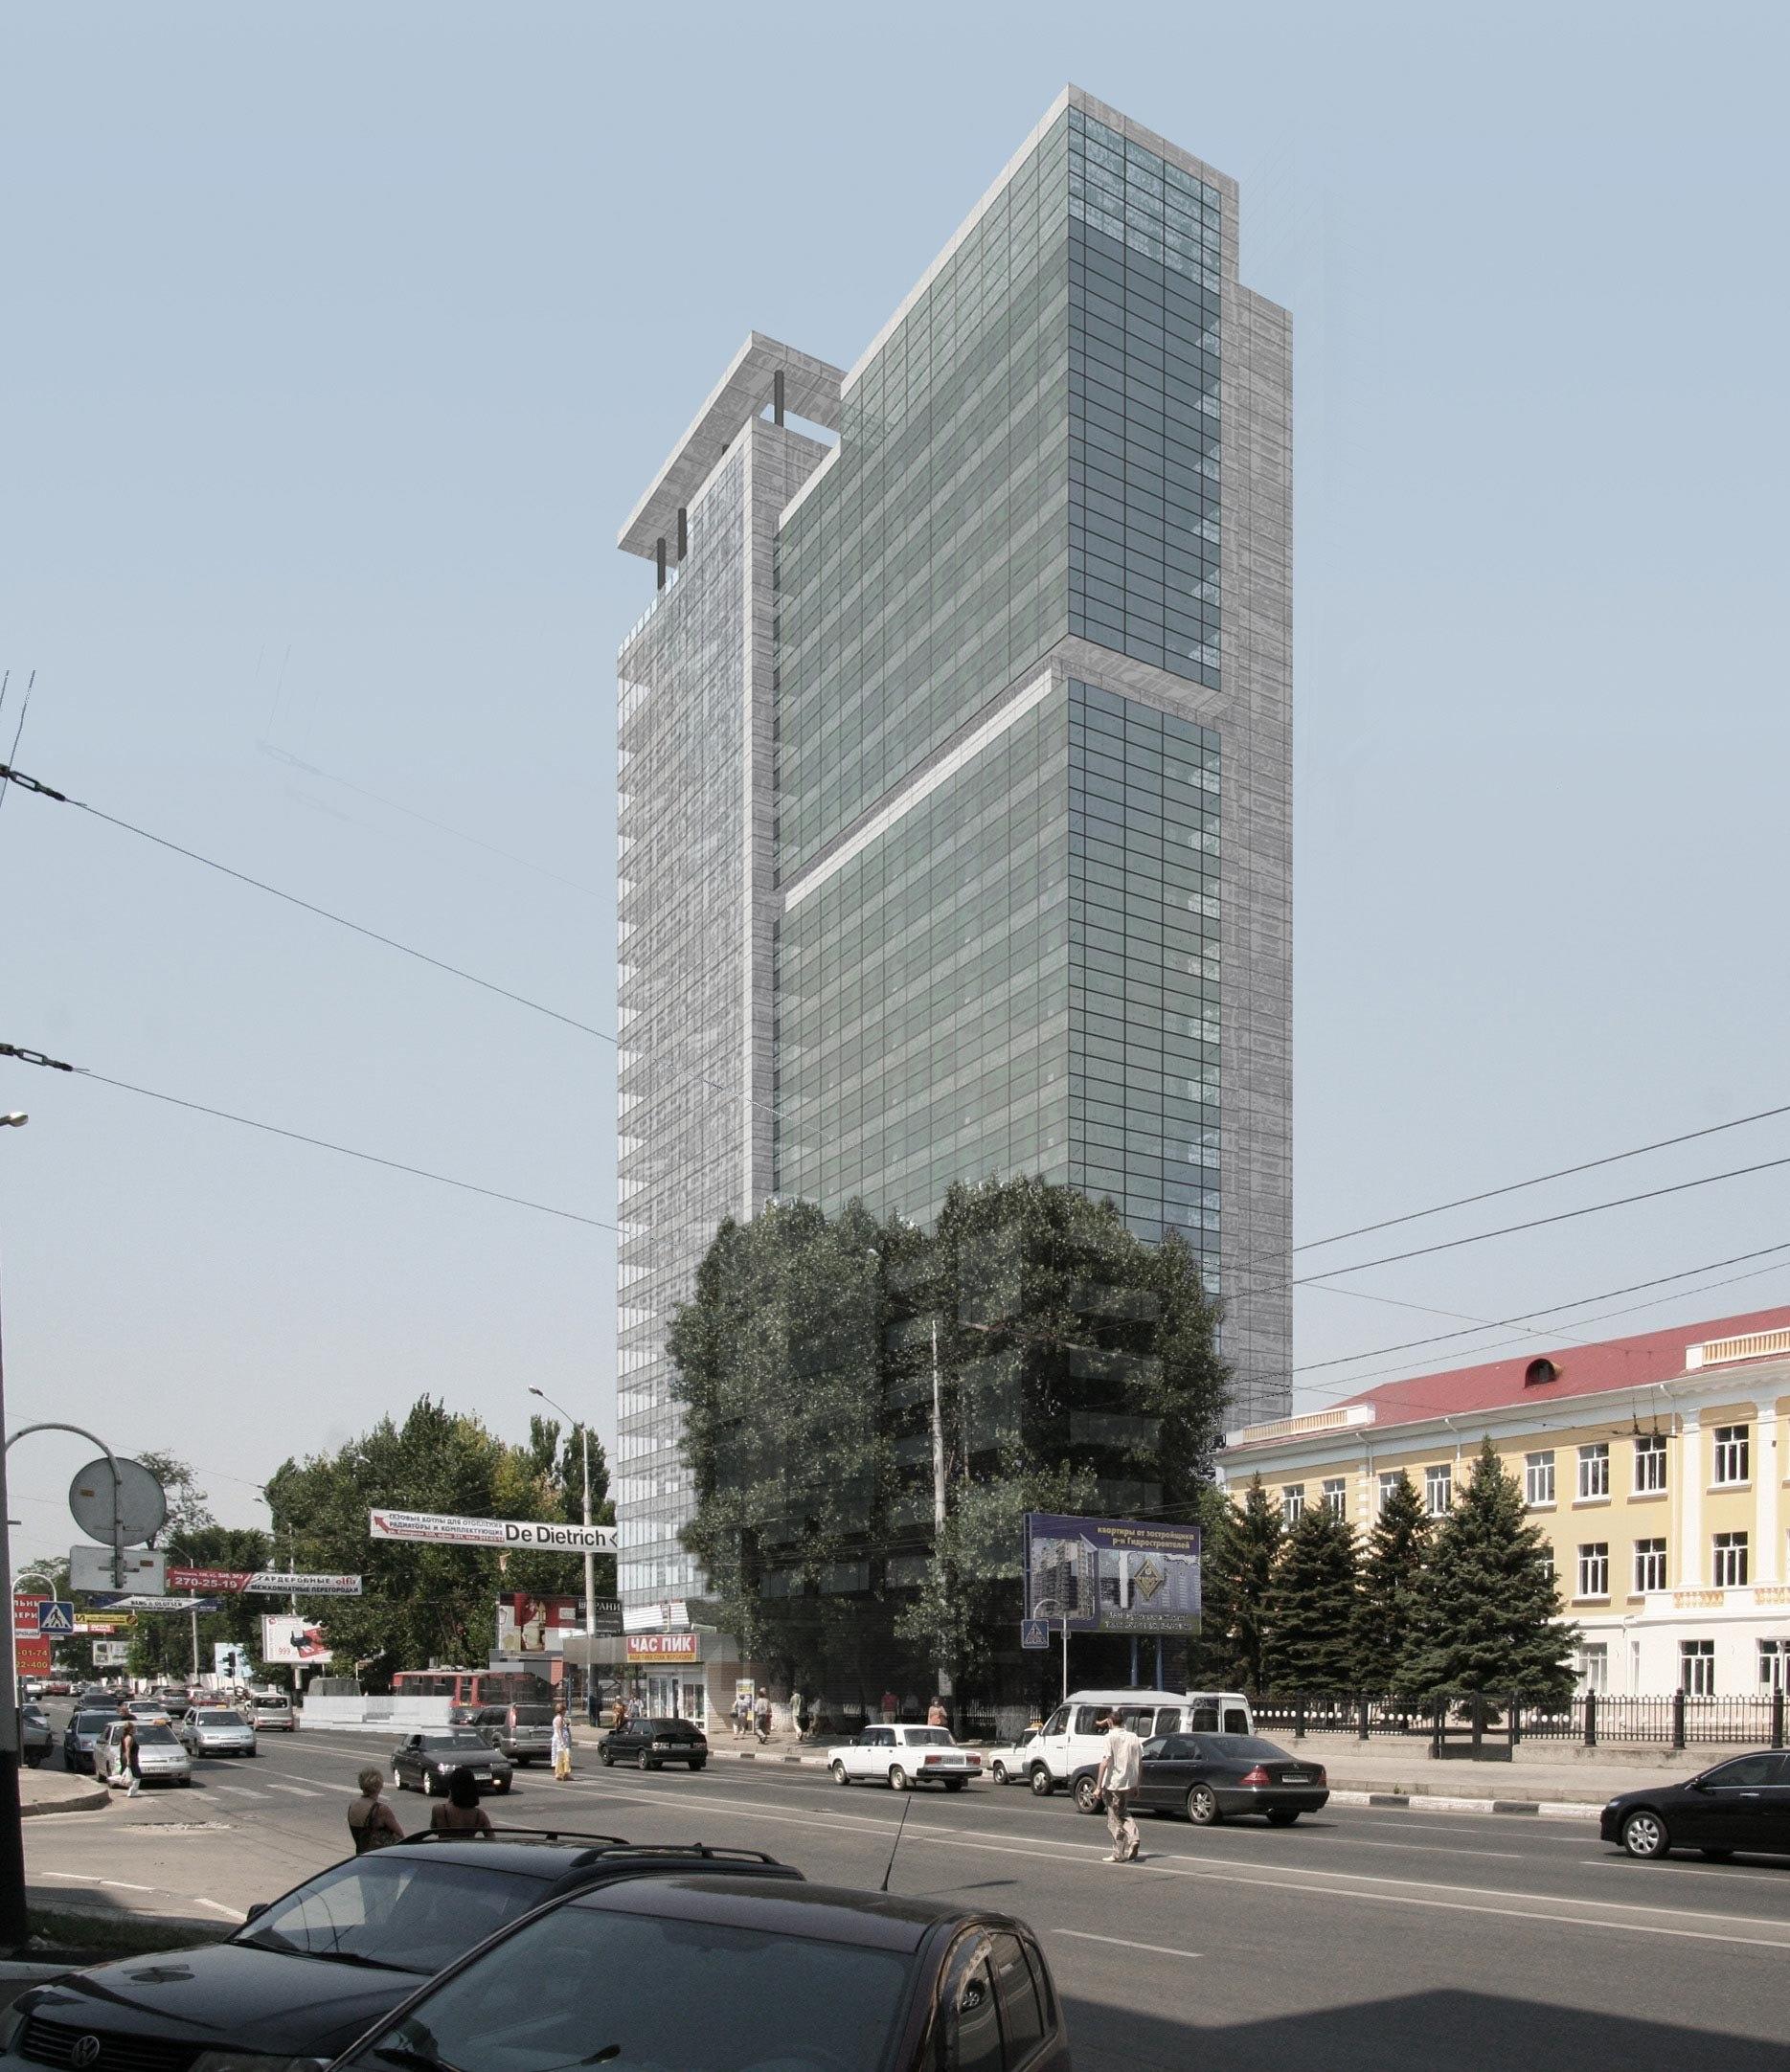 Group Of Office Buildings On Severnaya Street Krasnodar City